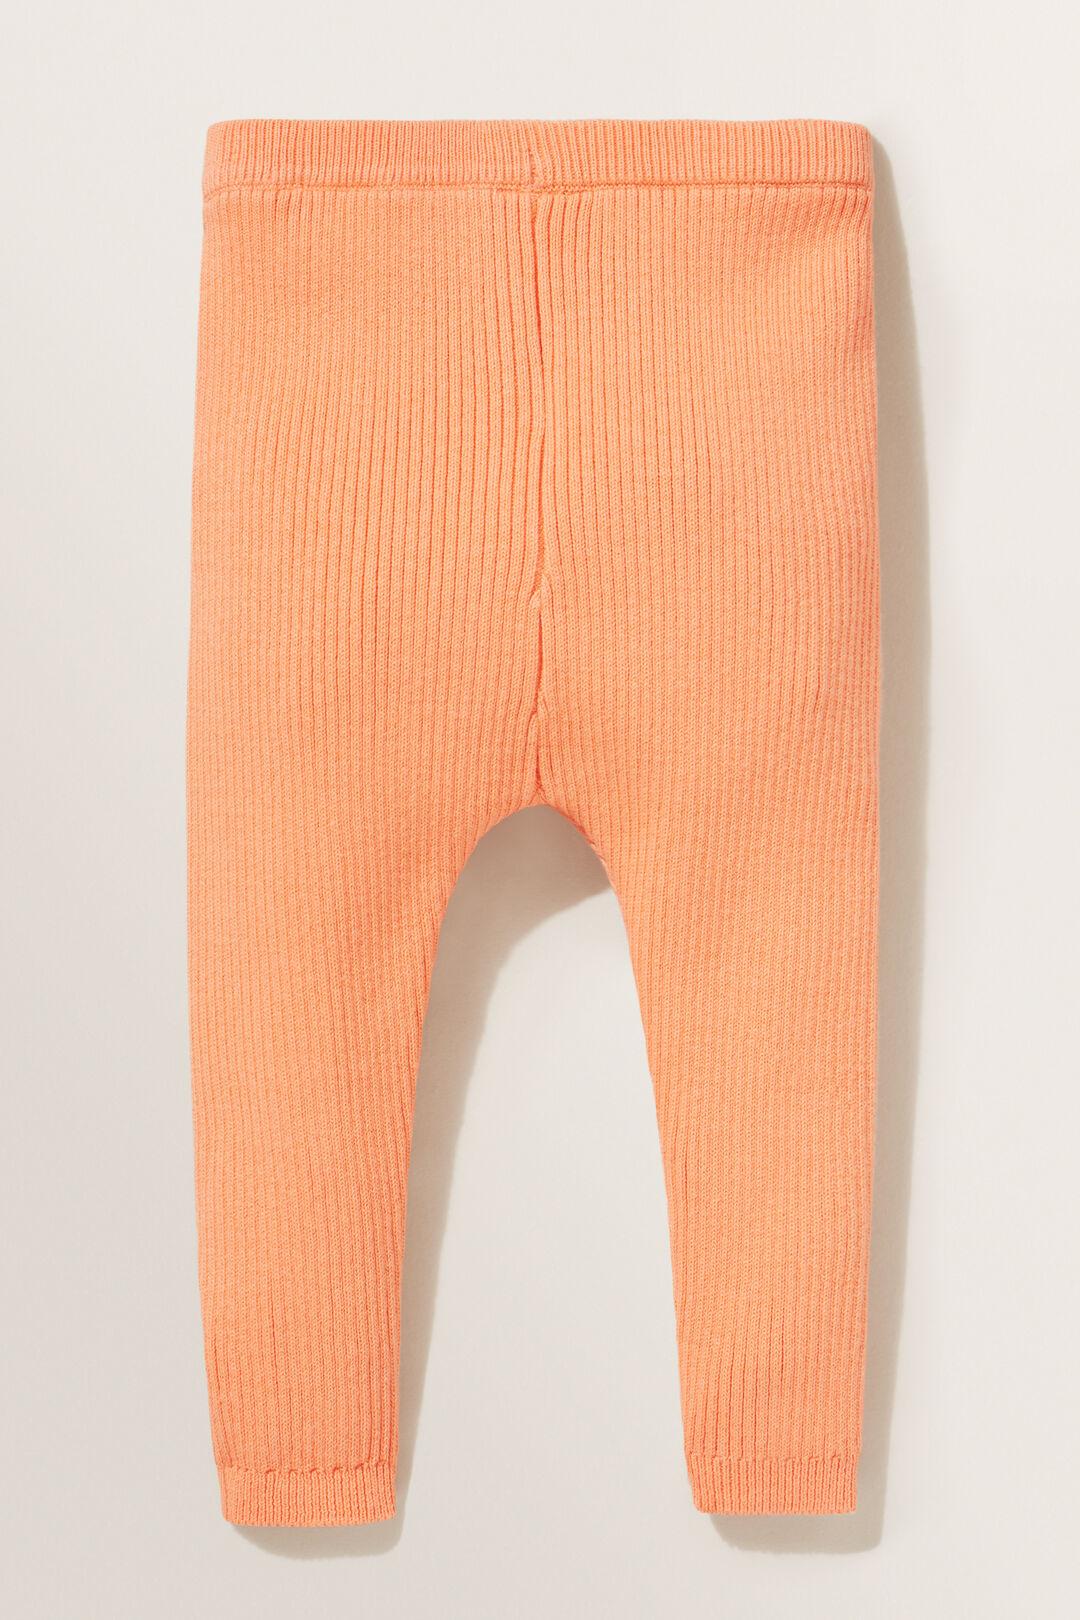 Rib Knit Leggings  APRICOT  hi-res